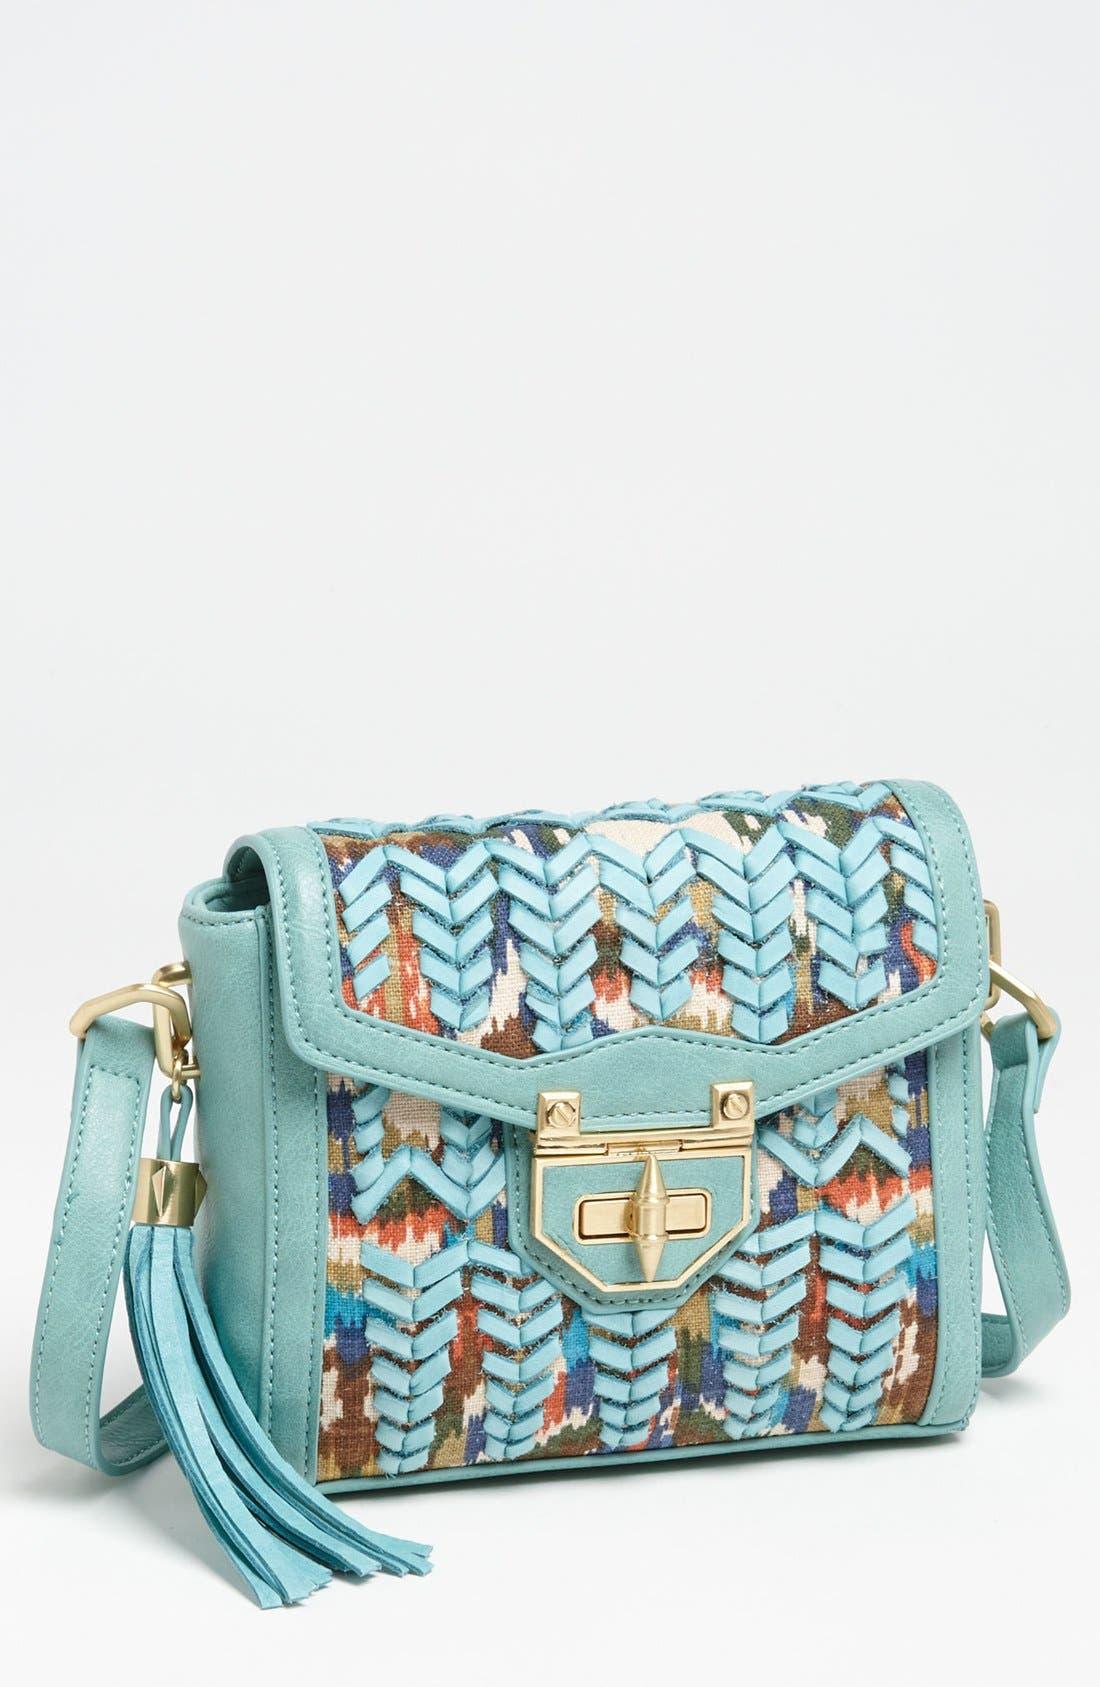 Alternate Image 1 Selected - Sam Edelman 'Neo-Tribe Savannah' Crossbody Bag